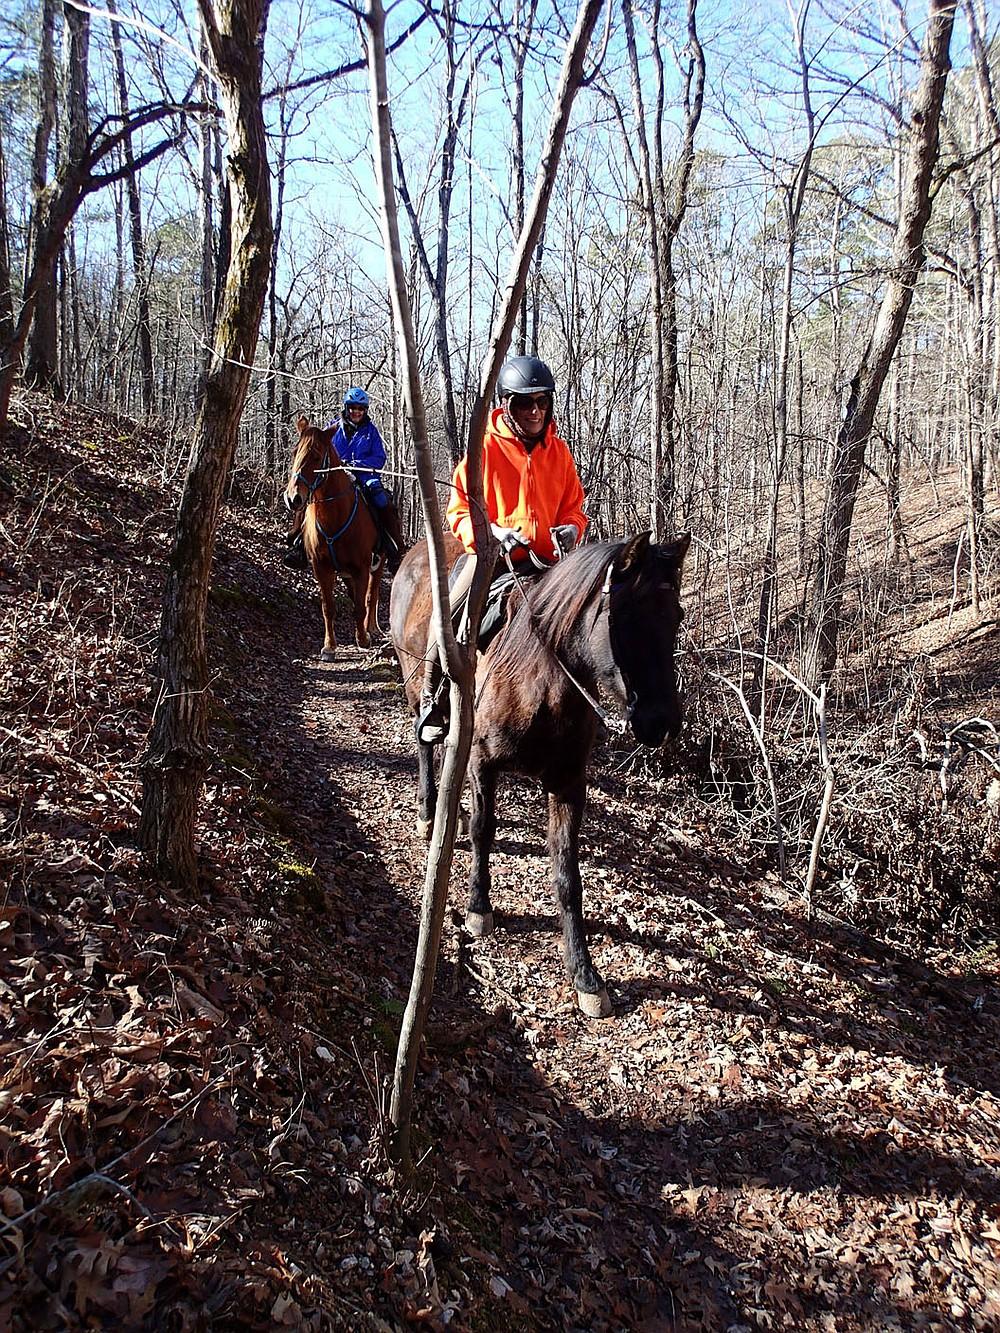 Horses and riders make their way along the War Eagle Valley Loop near the Townsend Ridge Road trailhead. (NWA Democrat-Gazette/Flip Putthoff)